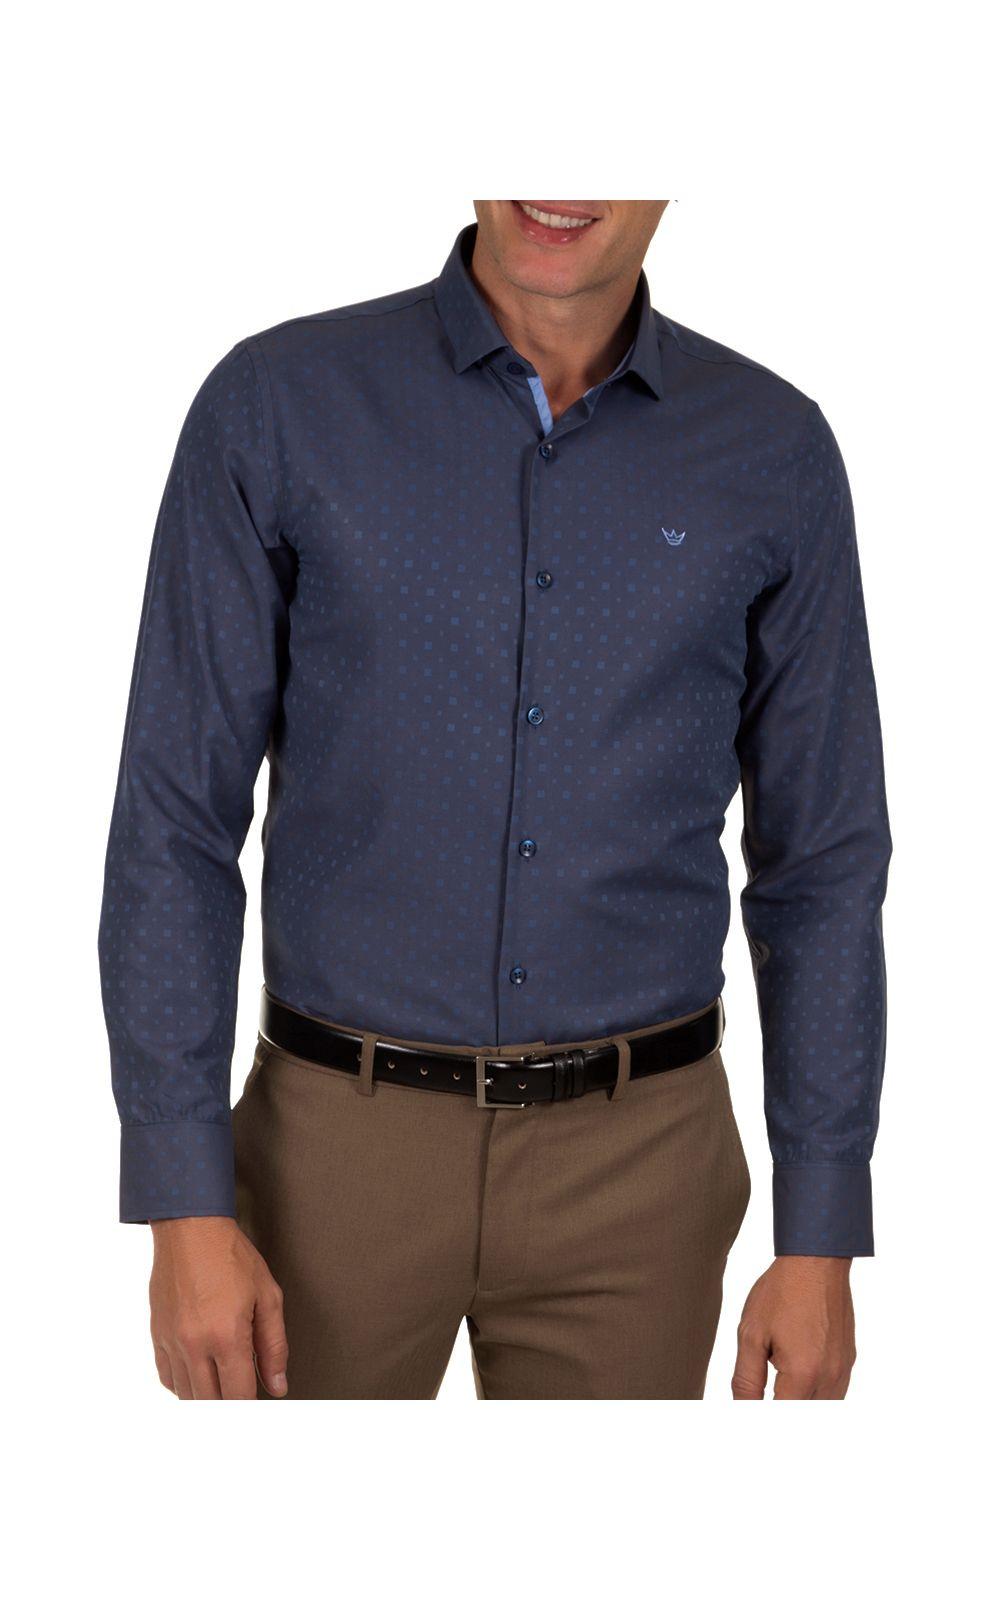 Foto 1 - Camisa Social Masculina Azul Detalhada